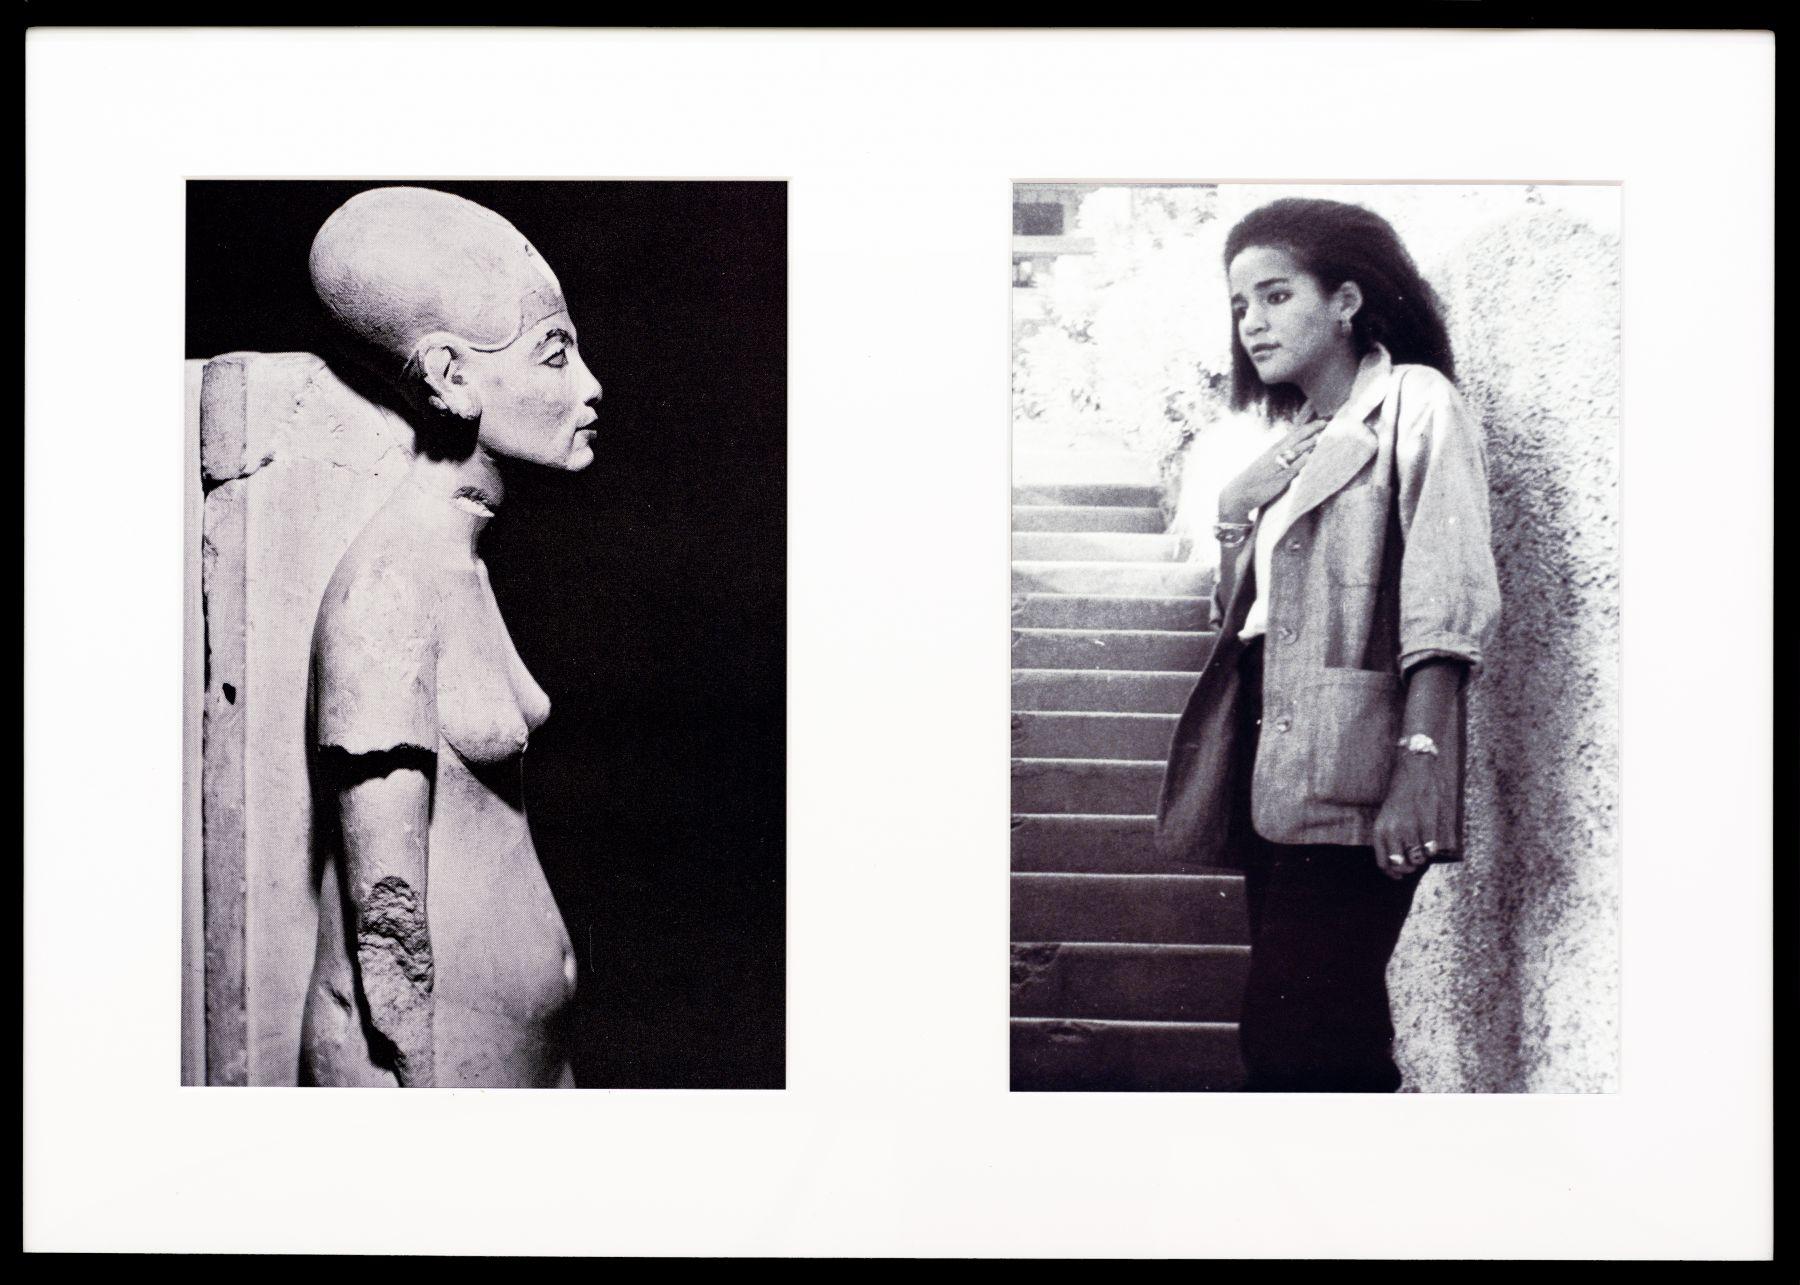 Lorraine O'Grady, Miscegenated Family Album (Cross Generational), L: Nefertiti, the last image; R: Devonia's youngest daughter, Kimberley, 1980/1994